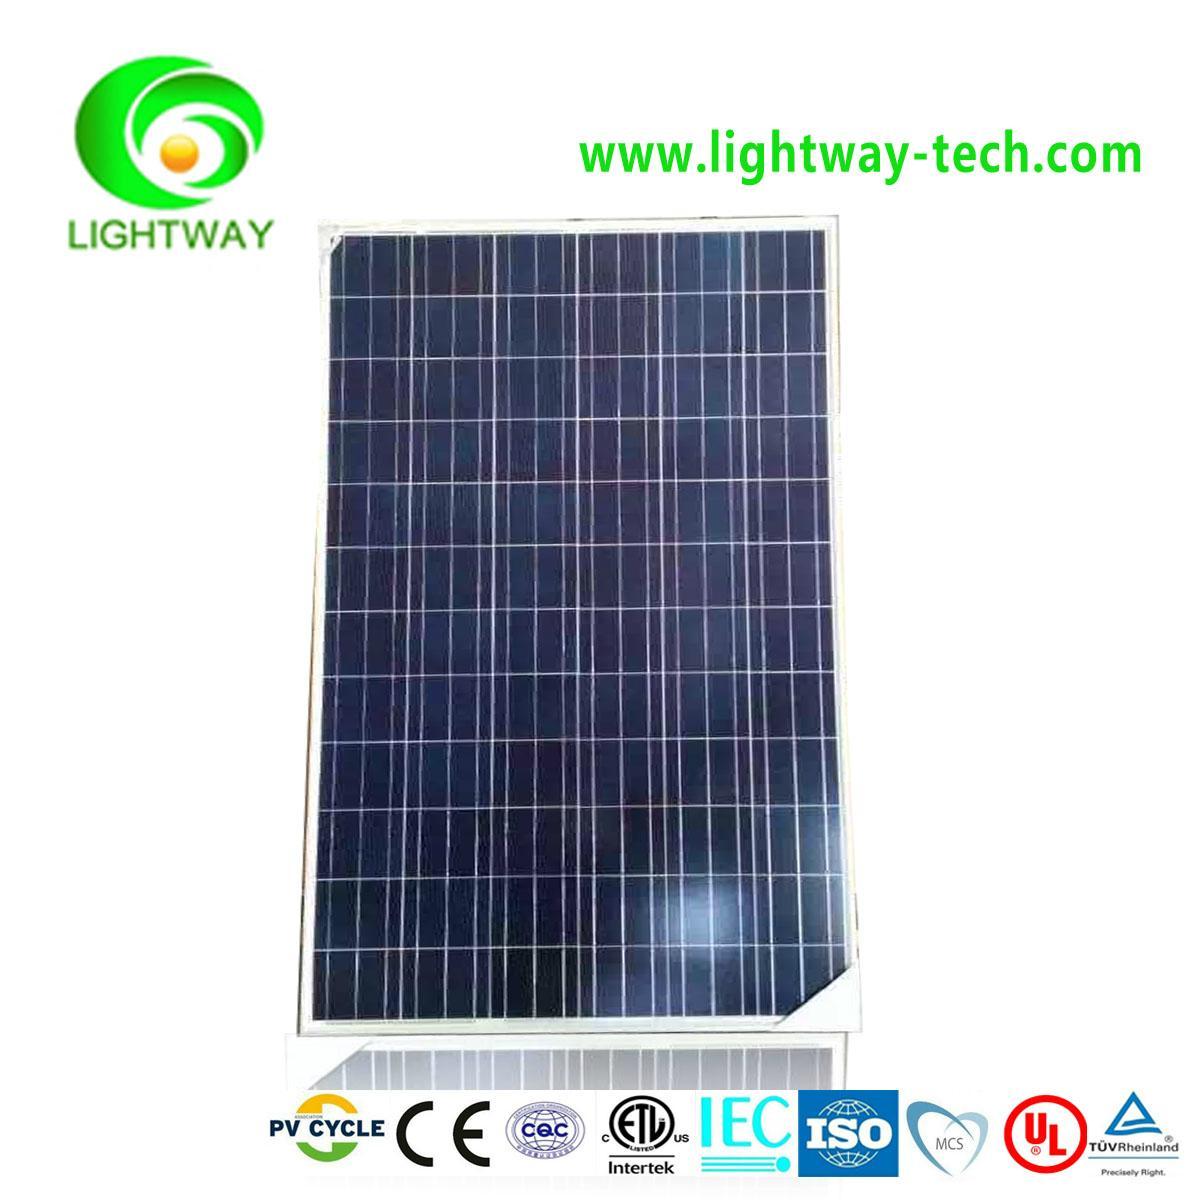 280w Polycrystalline Solar Panel Price India And 300watt